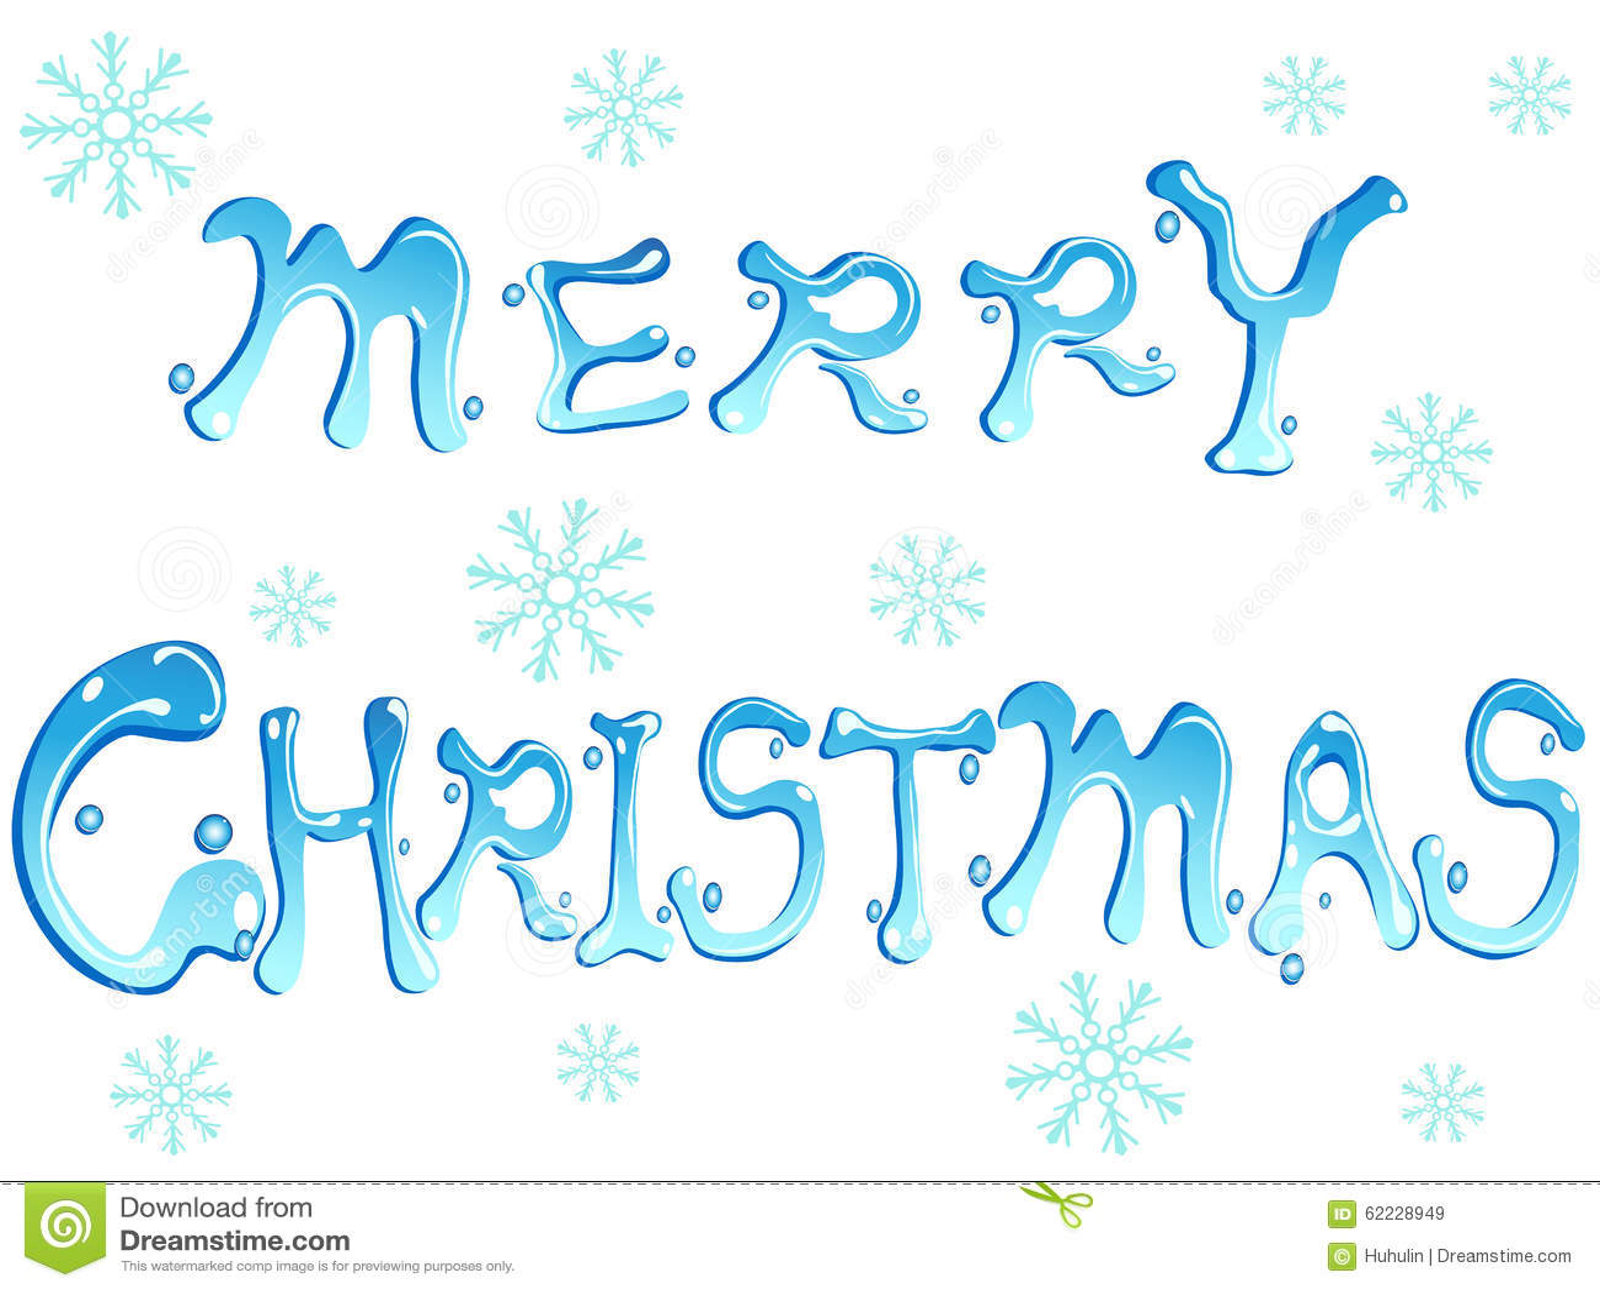 Merry Christmas Words Stock Vector